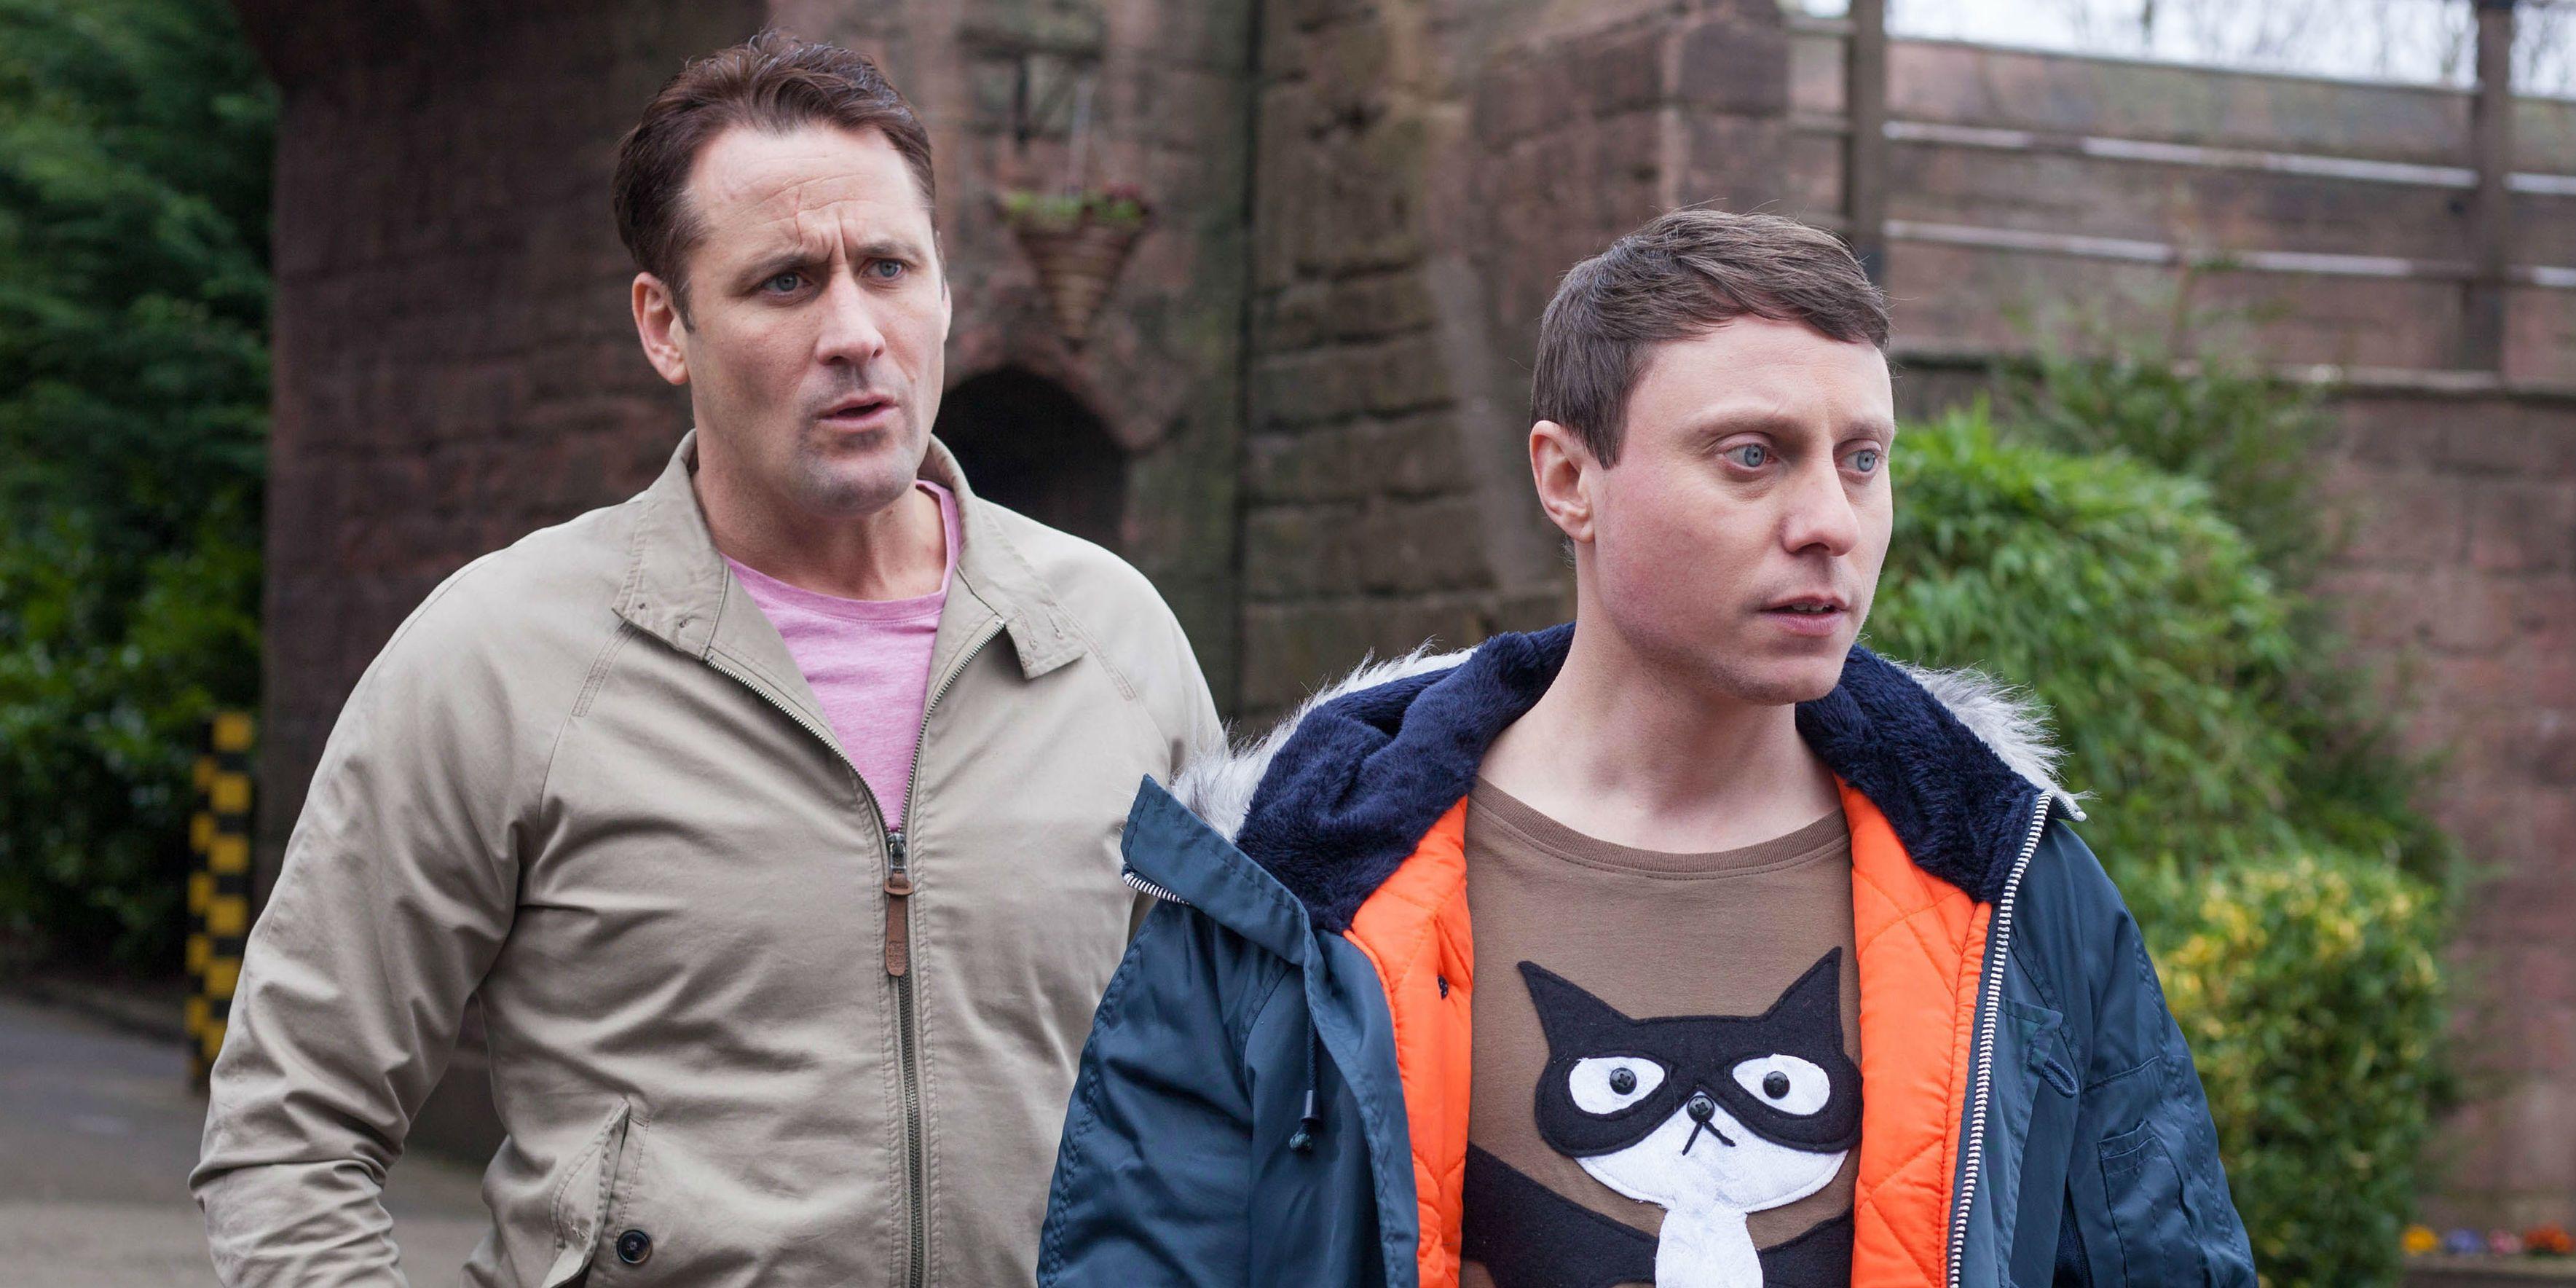 Tony Hutchinson and Milo Entwistle in Hollyoaks